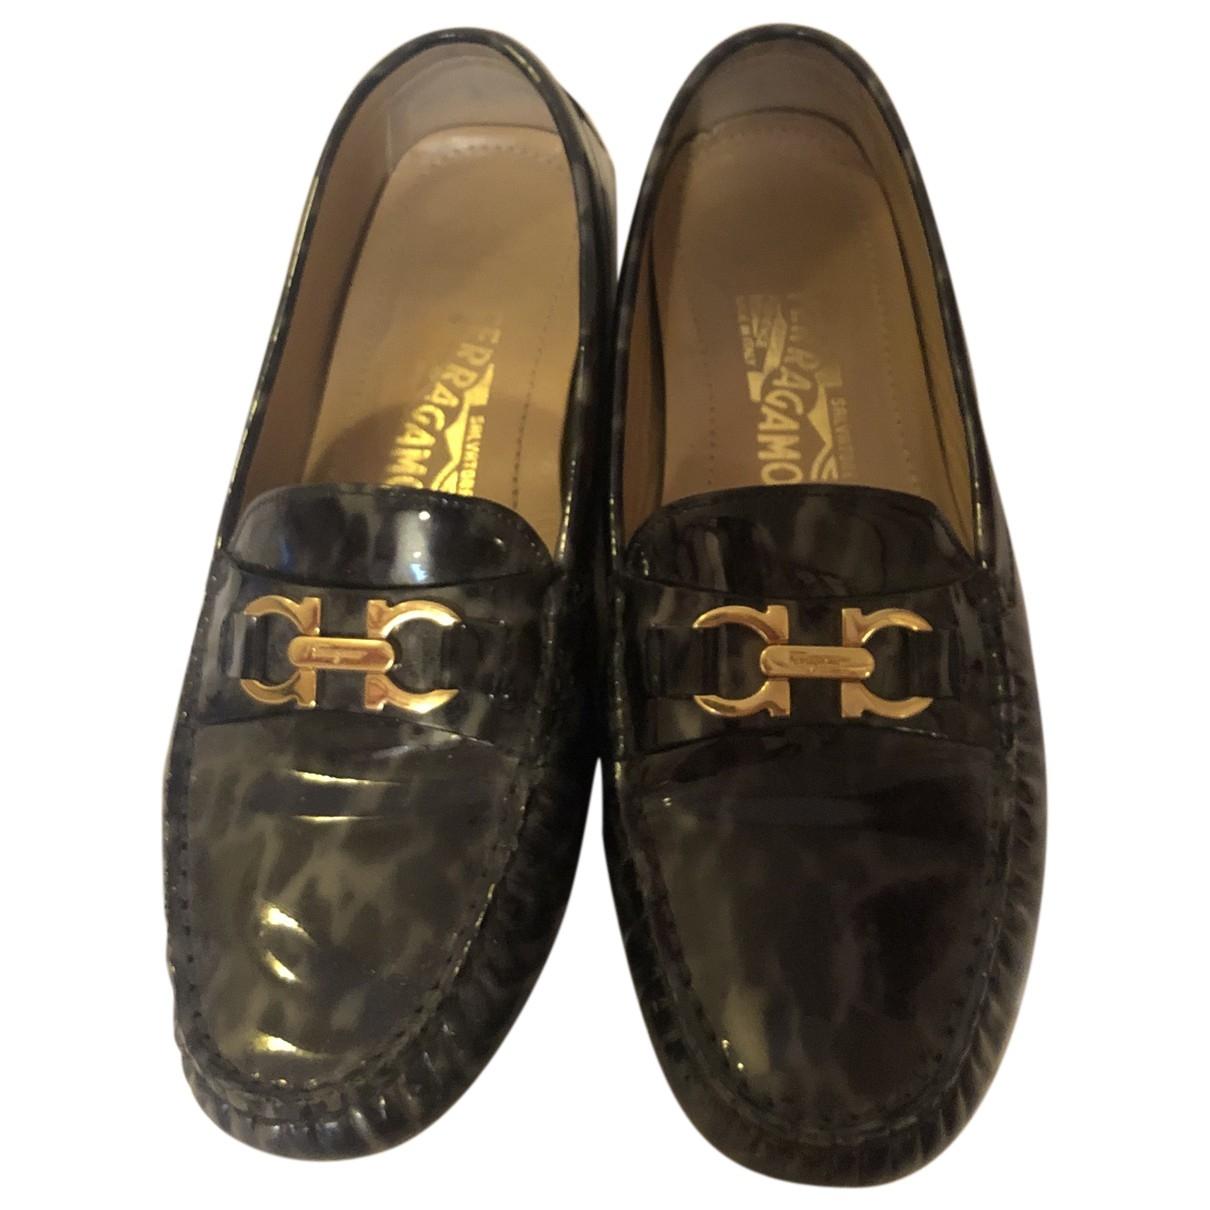 Salvatore Ferragamo \N Anthracite Patent leather Flats for Women 37 EU